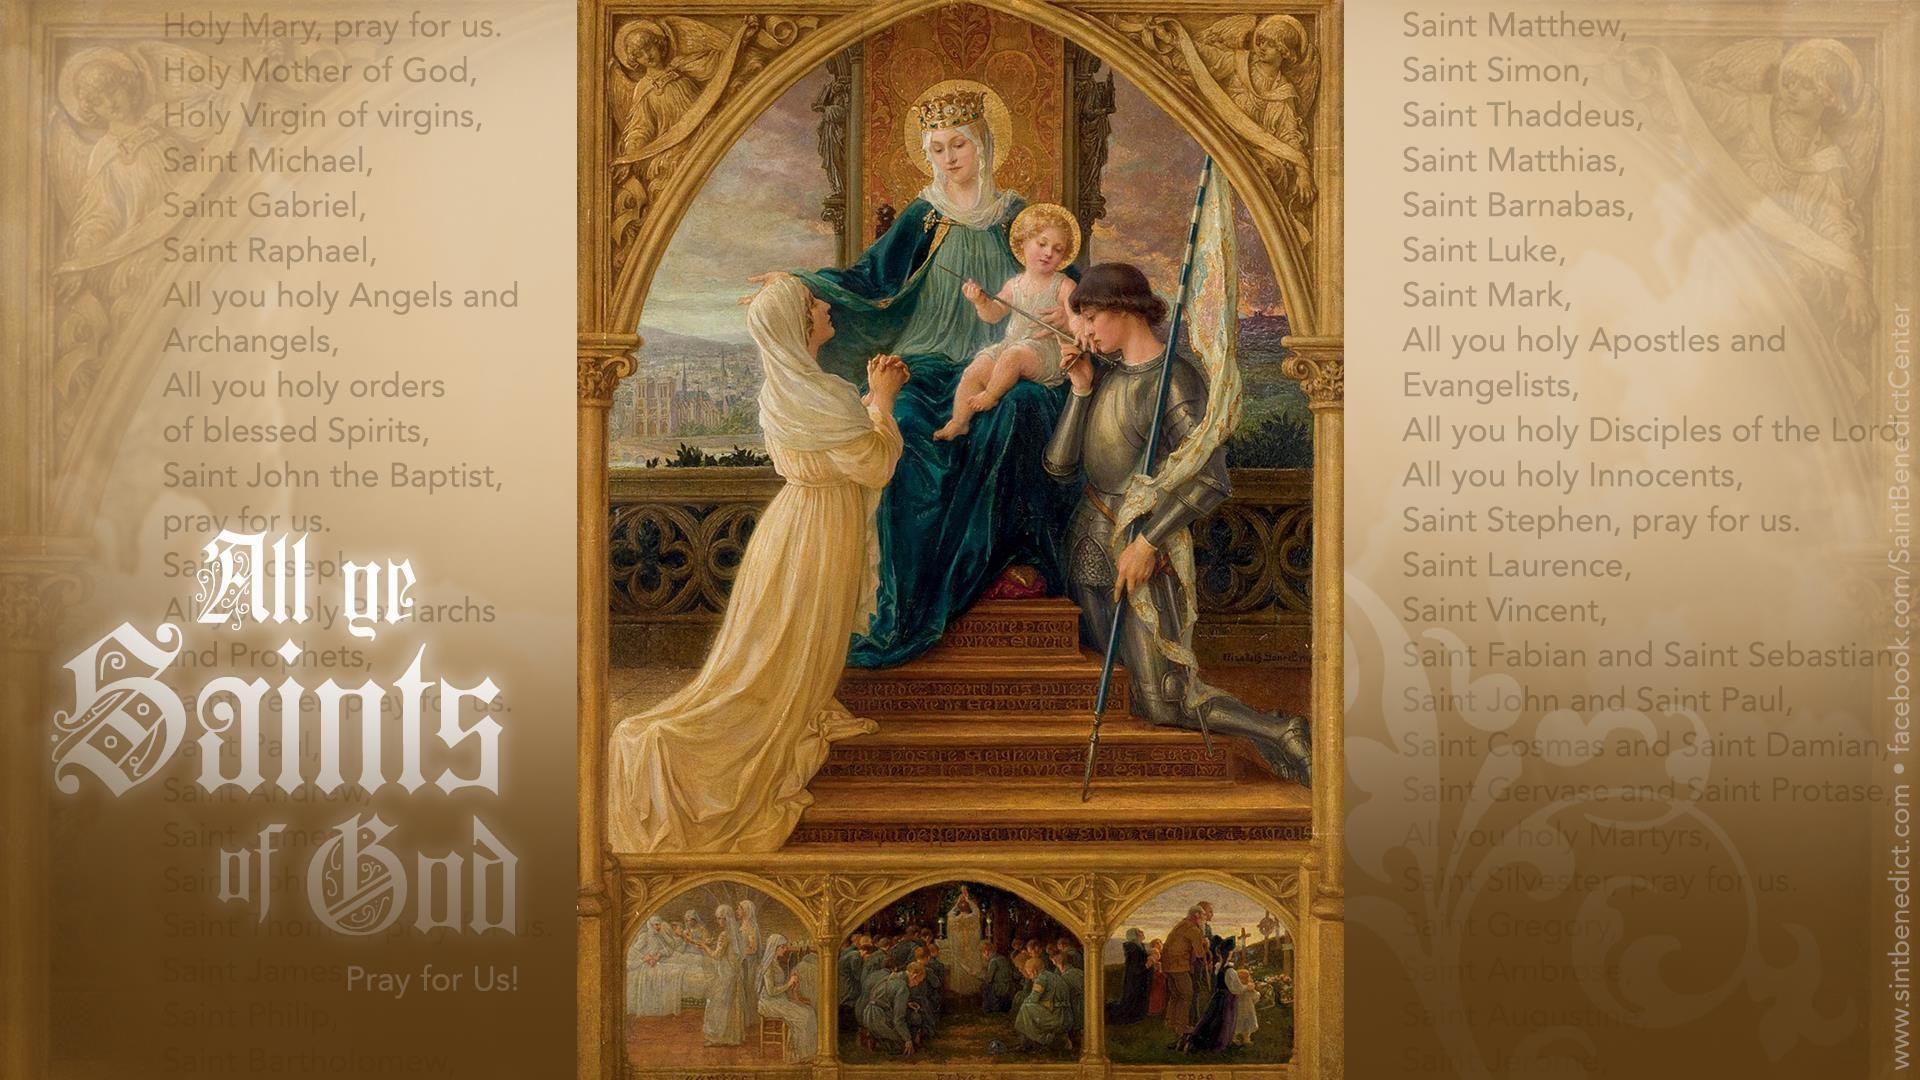 All Ye Saints Of God Pray For Us Catholic Wallpaper The Feast CSaint Benedict Center Still River MA Saintbenedict